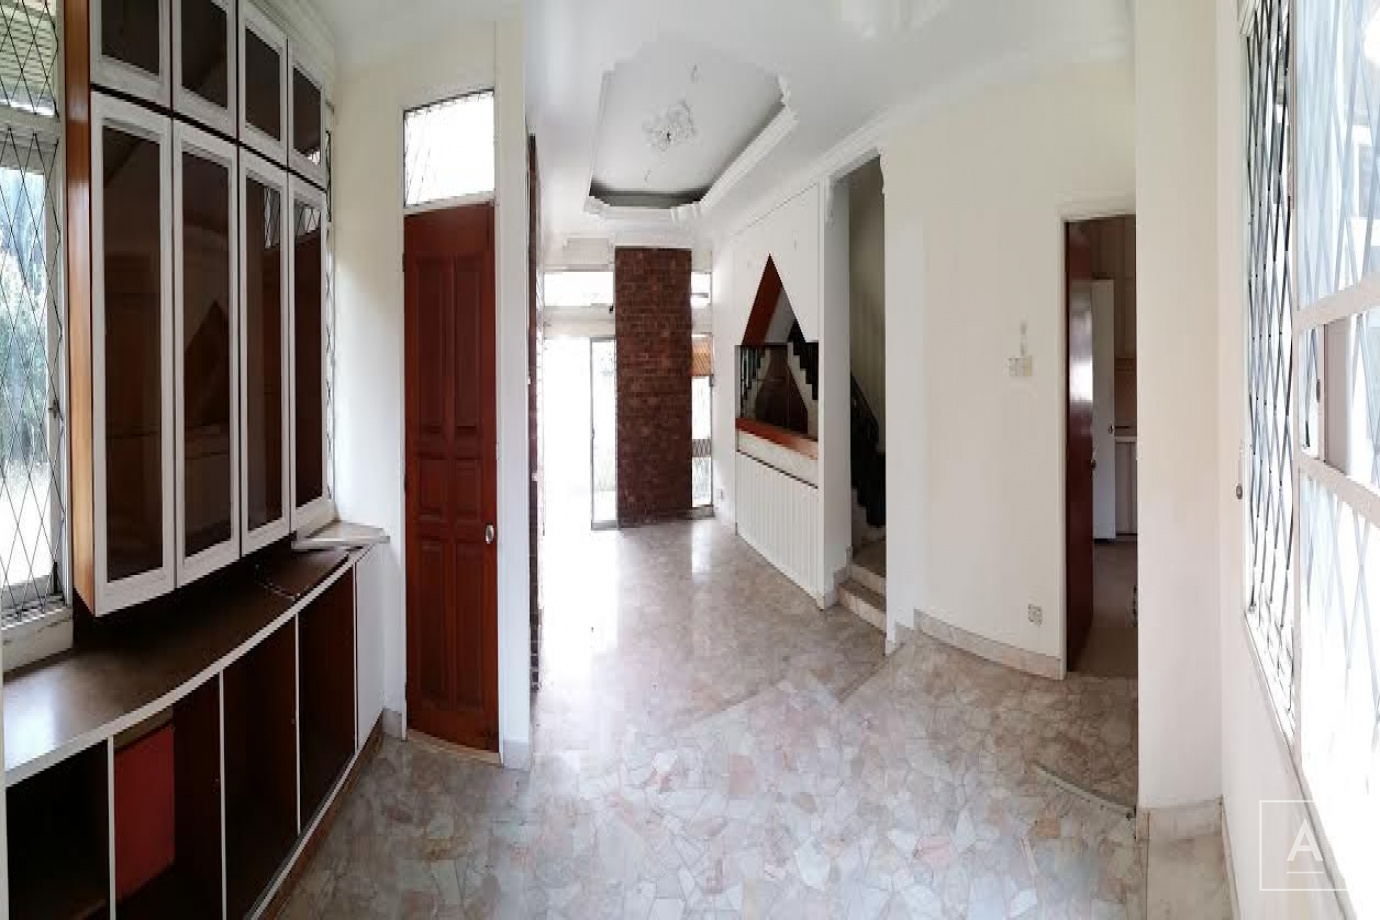 Jalan Ampang Hilir, Ampang,Kuala Lumpur, 4 Bedrooms Bedrooms, ,4 BathroomsBathrooms,Bungalow / Detached,For Sale,Jalan Ampang Hilir,1043